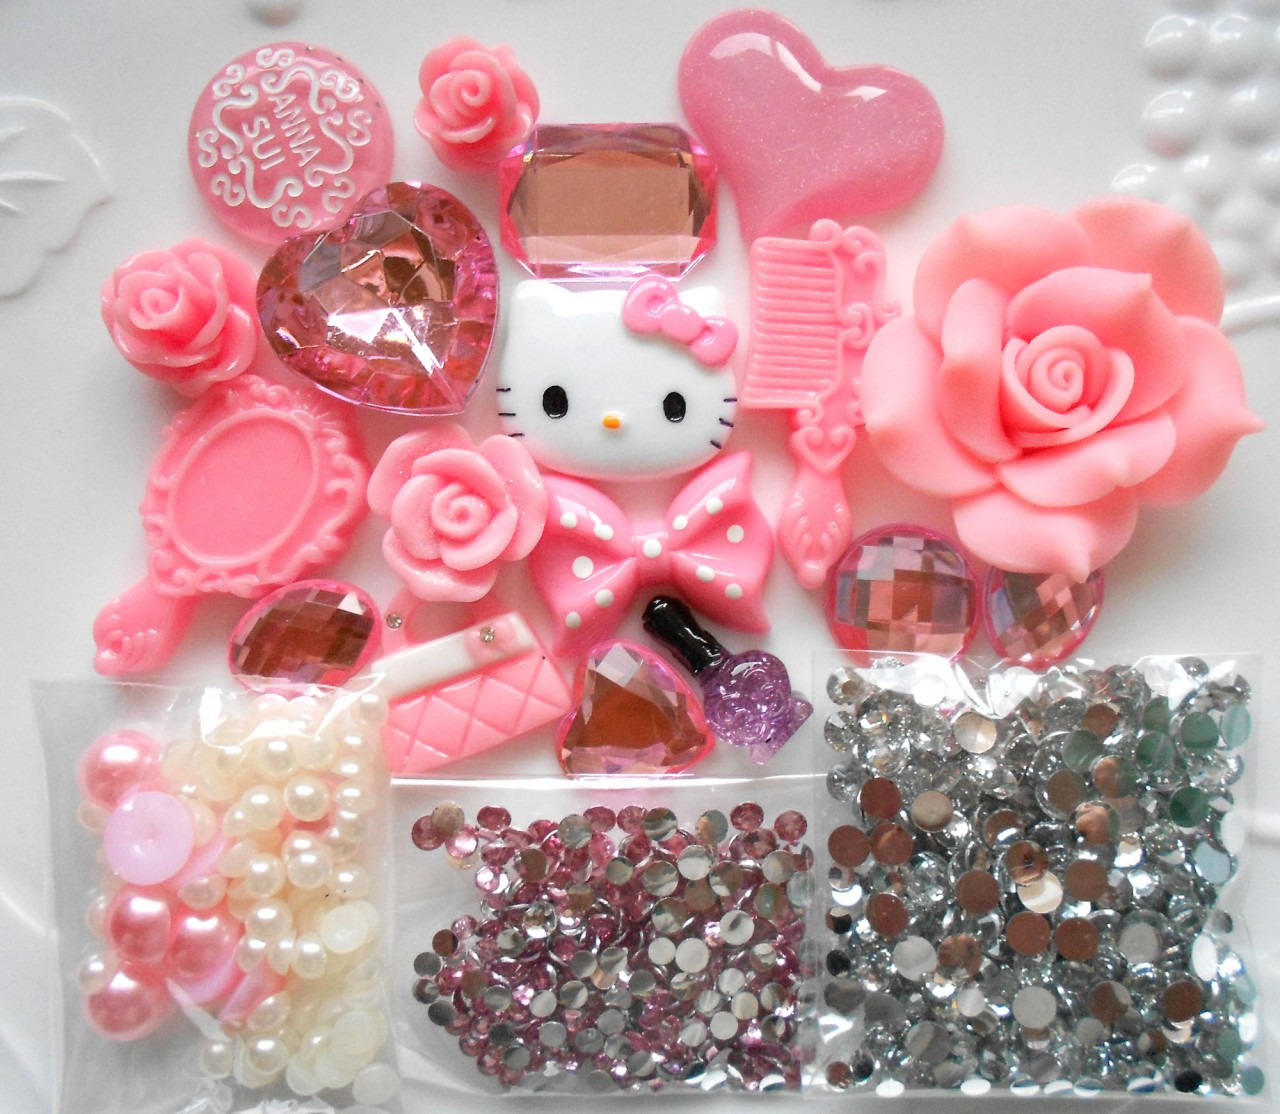 a04b4e507 DIY 3D Hello Kitty Bling Resin Flat back Kawaii Cabochons Deco Kit Z285 --  lovekittybling. Price: $13.99. Image 1